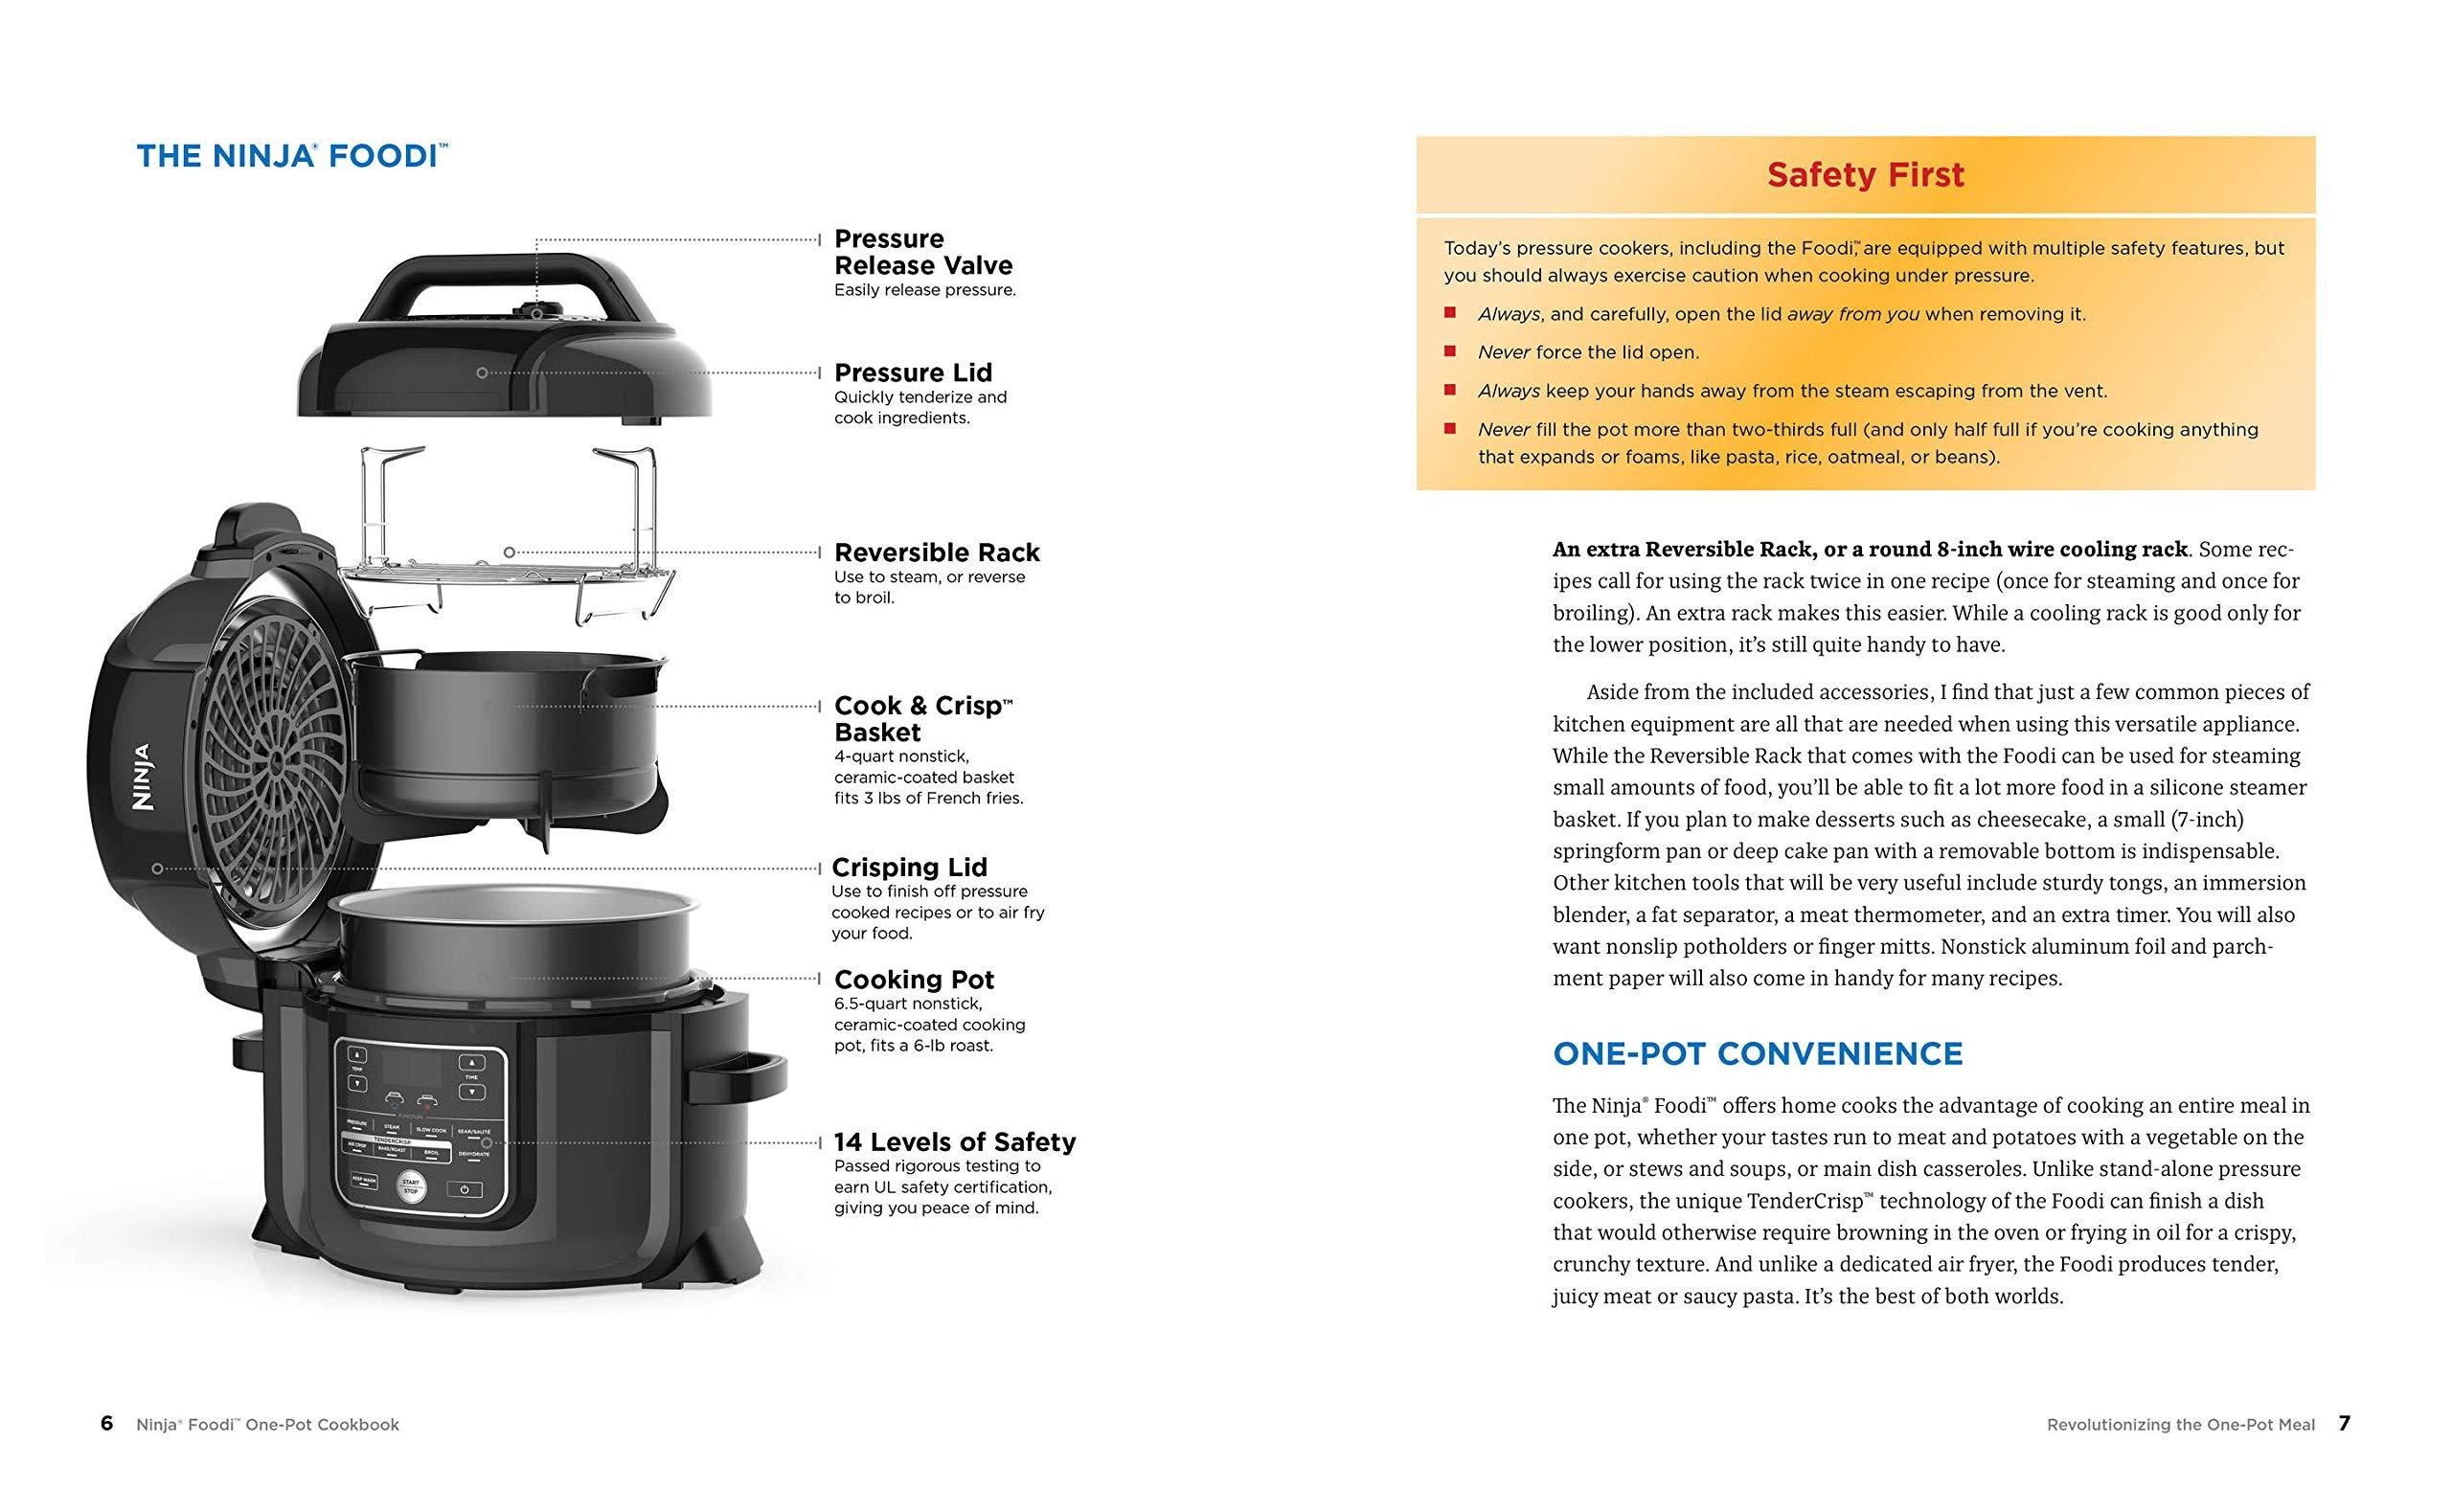 Ninja Foodi - the Pressure Cooker That Crisps - One-Pot ...